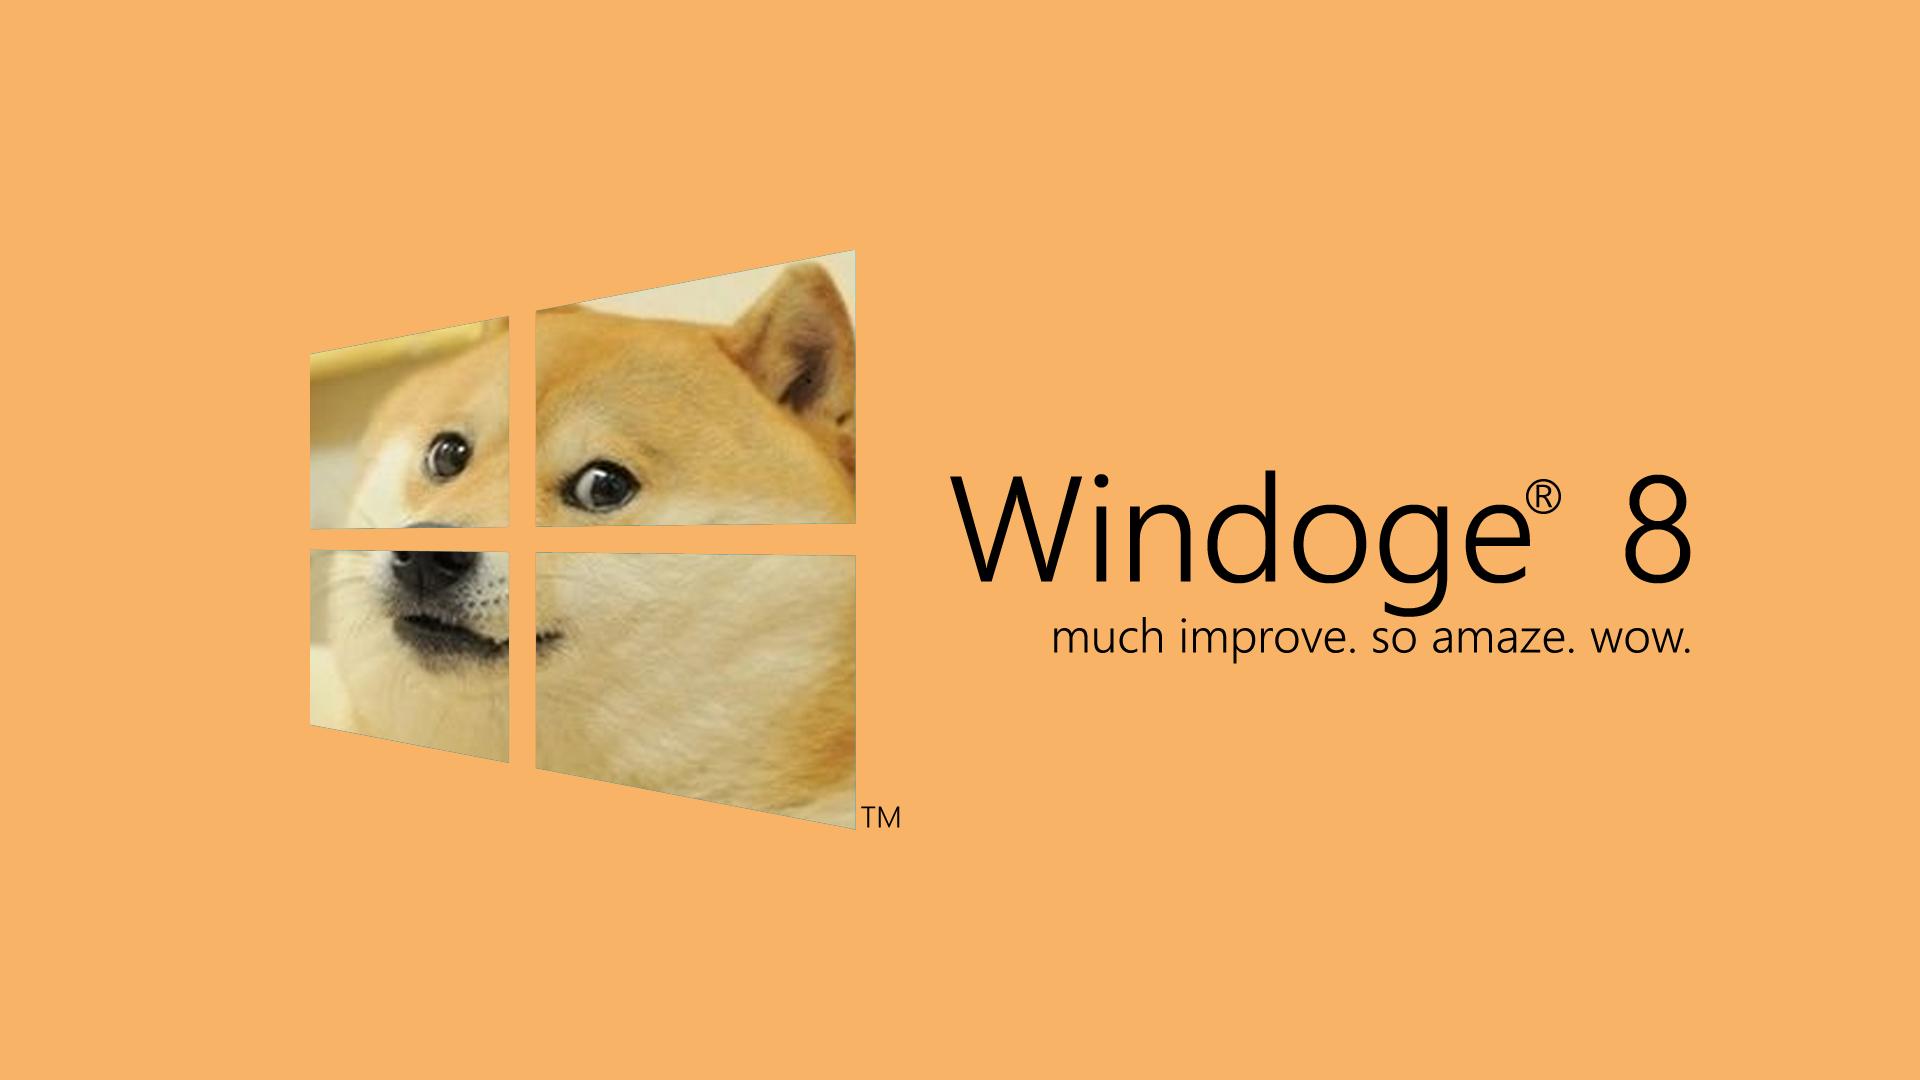 You Guys Got Windoge 8 Doge Meme Very Funny Memes Funny Doge